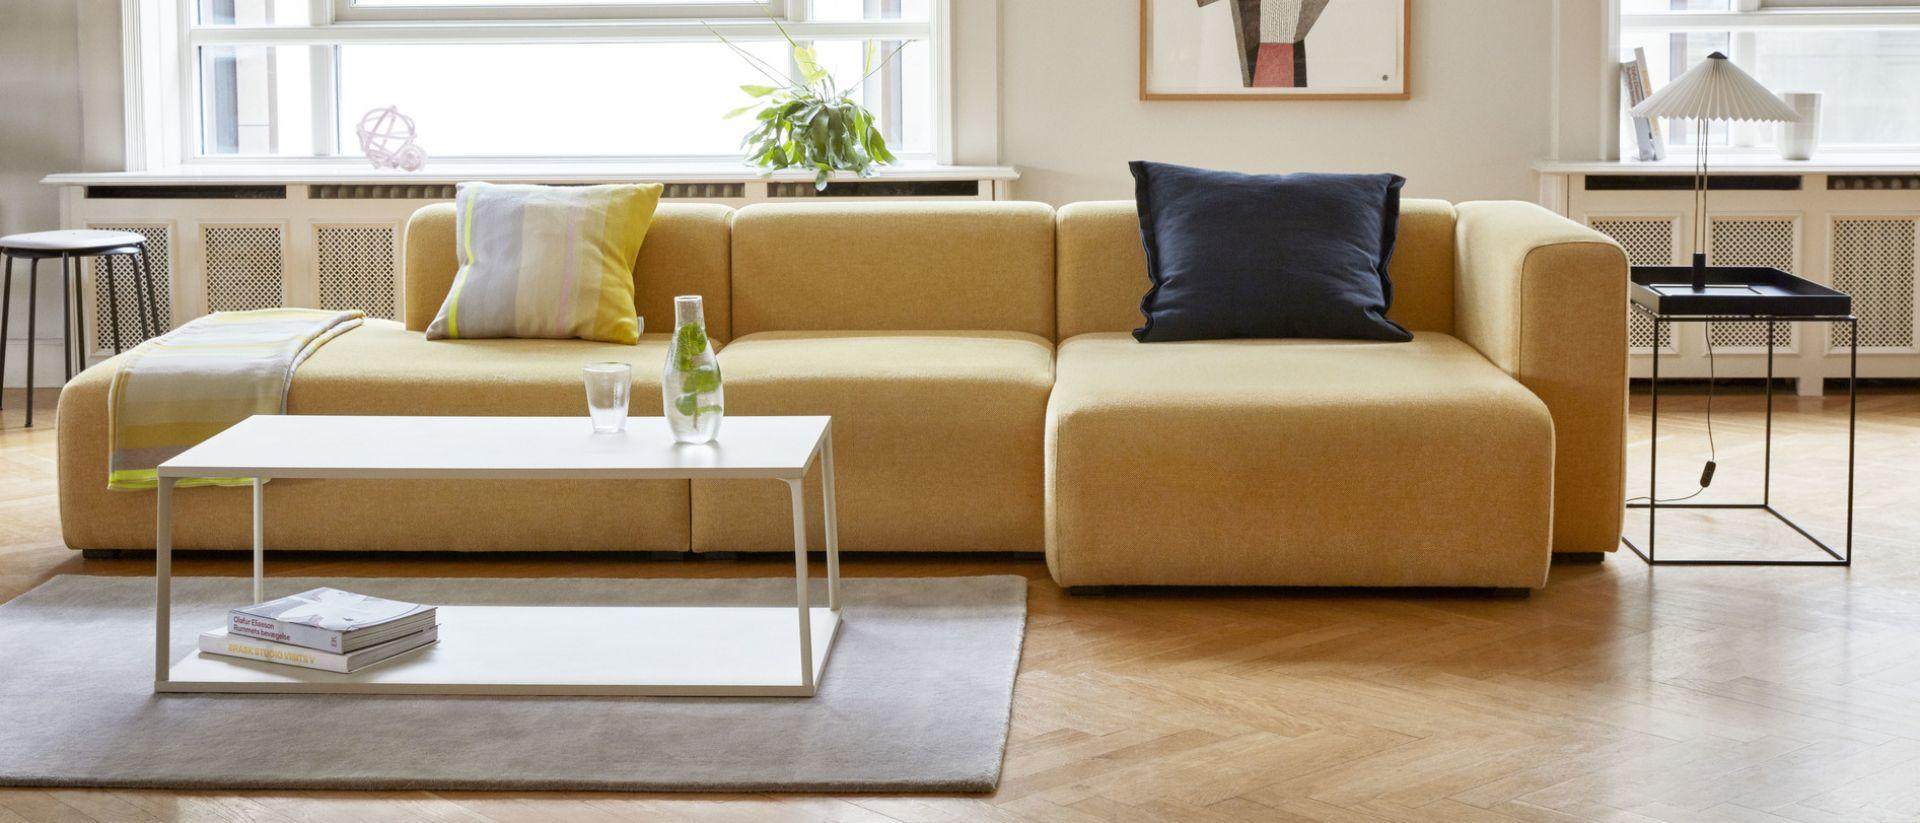 Mags Soft Sofa 3-Sitzer Combination 4 Hay